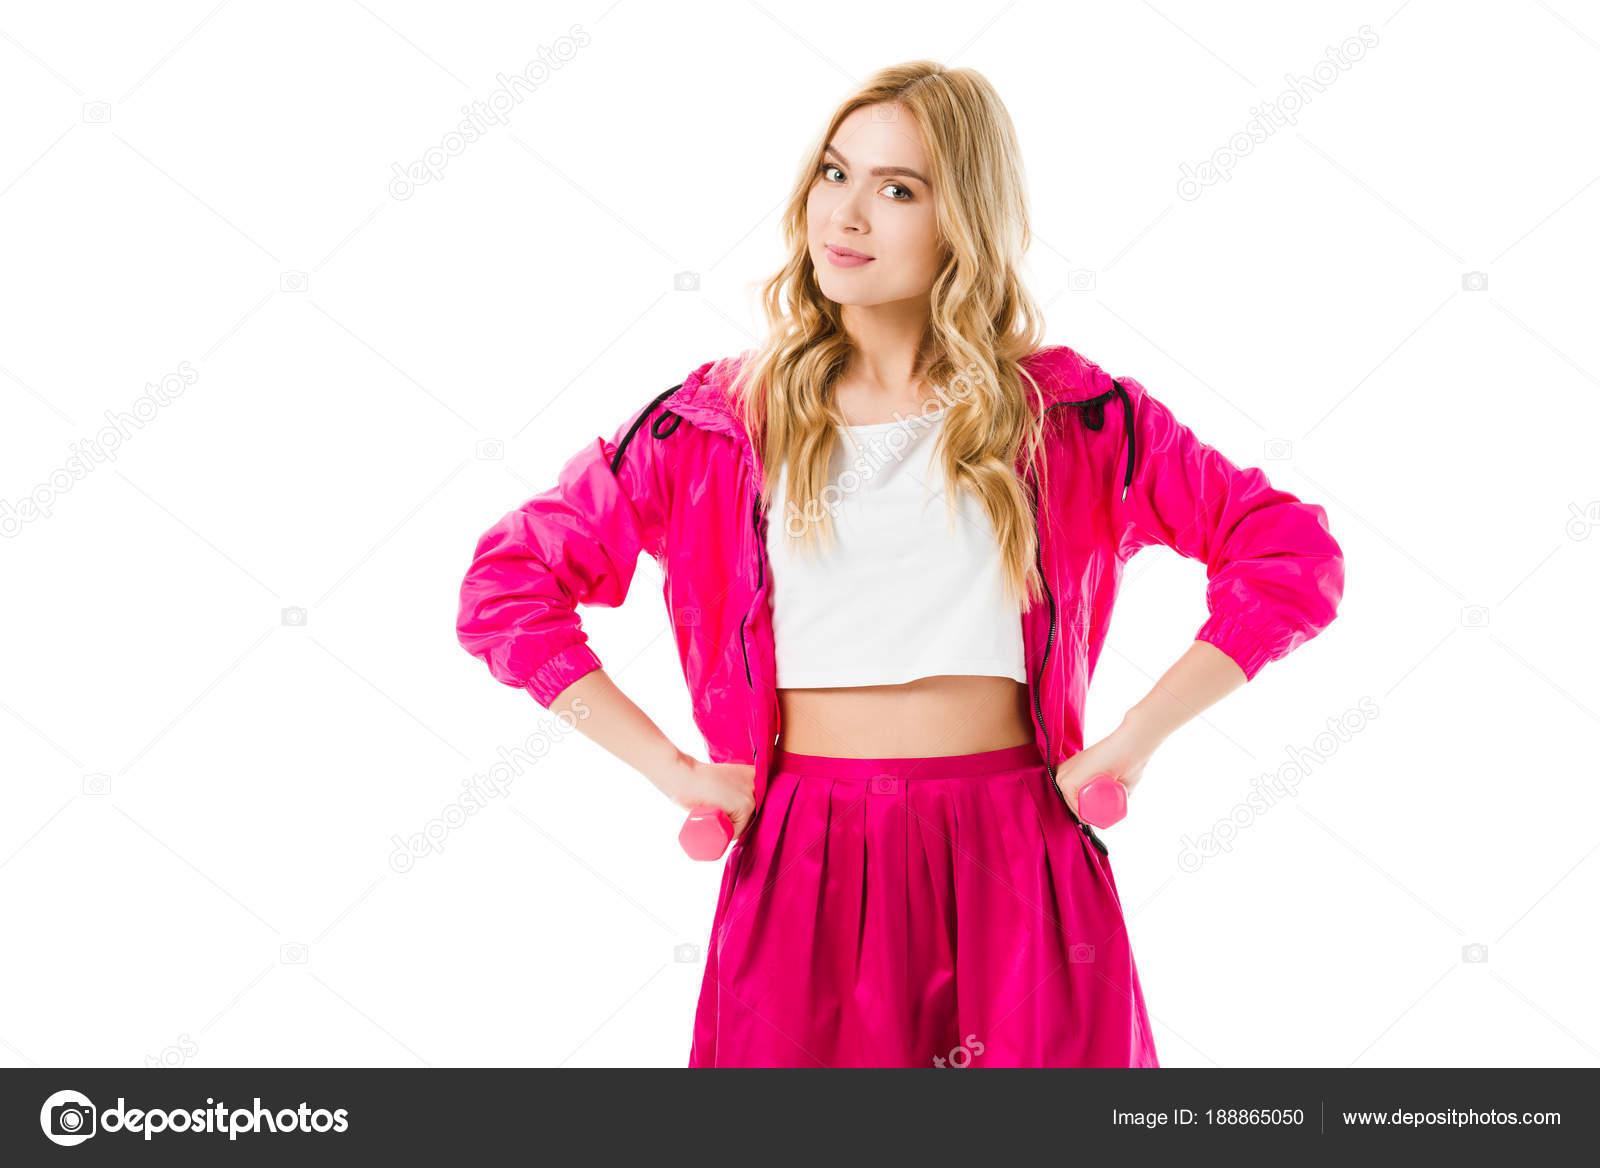 fc65cb286b2 Ξανθιά Γυναίκα Στο Ροζ Ρούχα Στέκεται Αλτήρες Που Απομονώνονται Λευκό —  Φωτογραφία Αρχείου